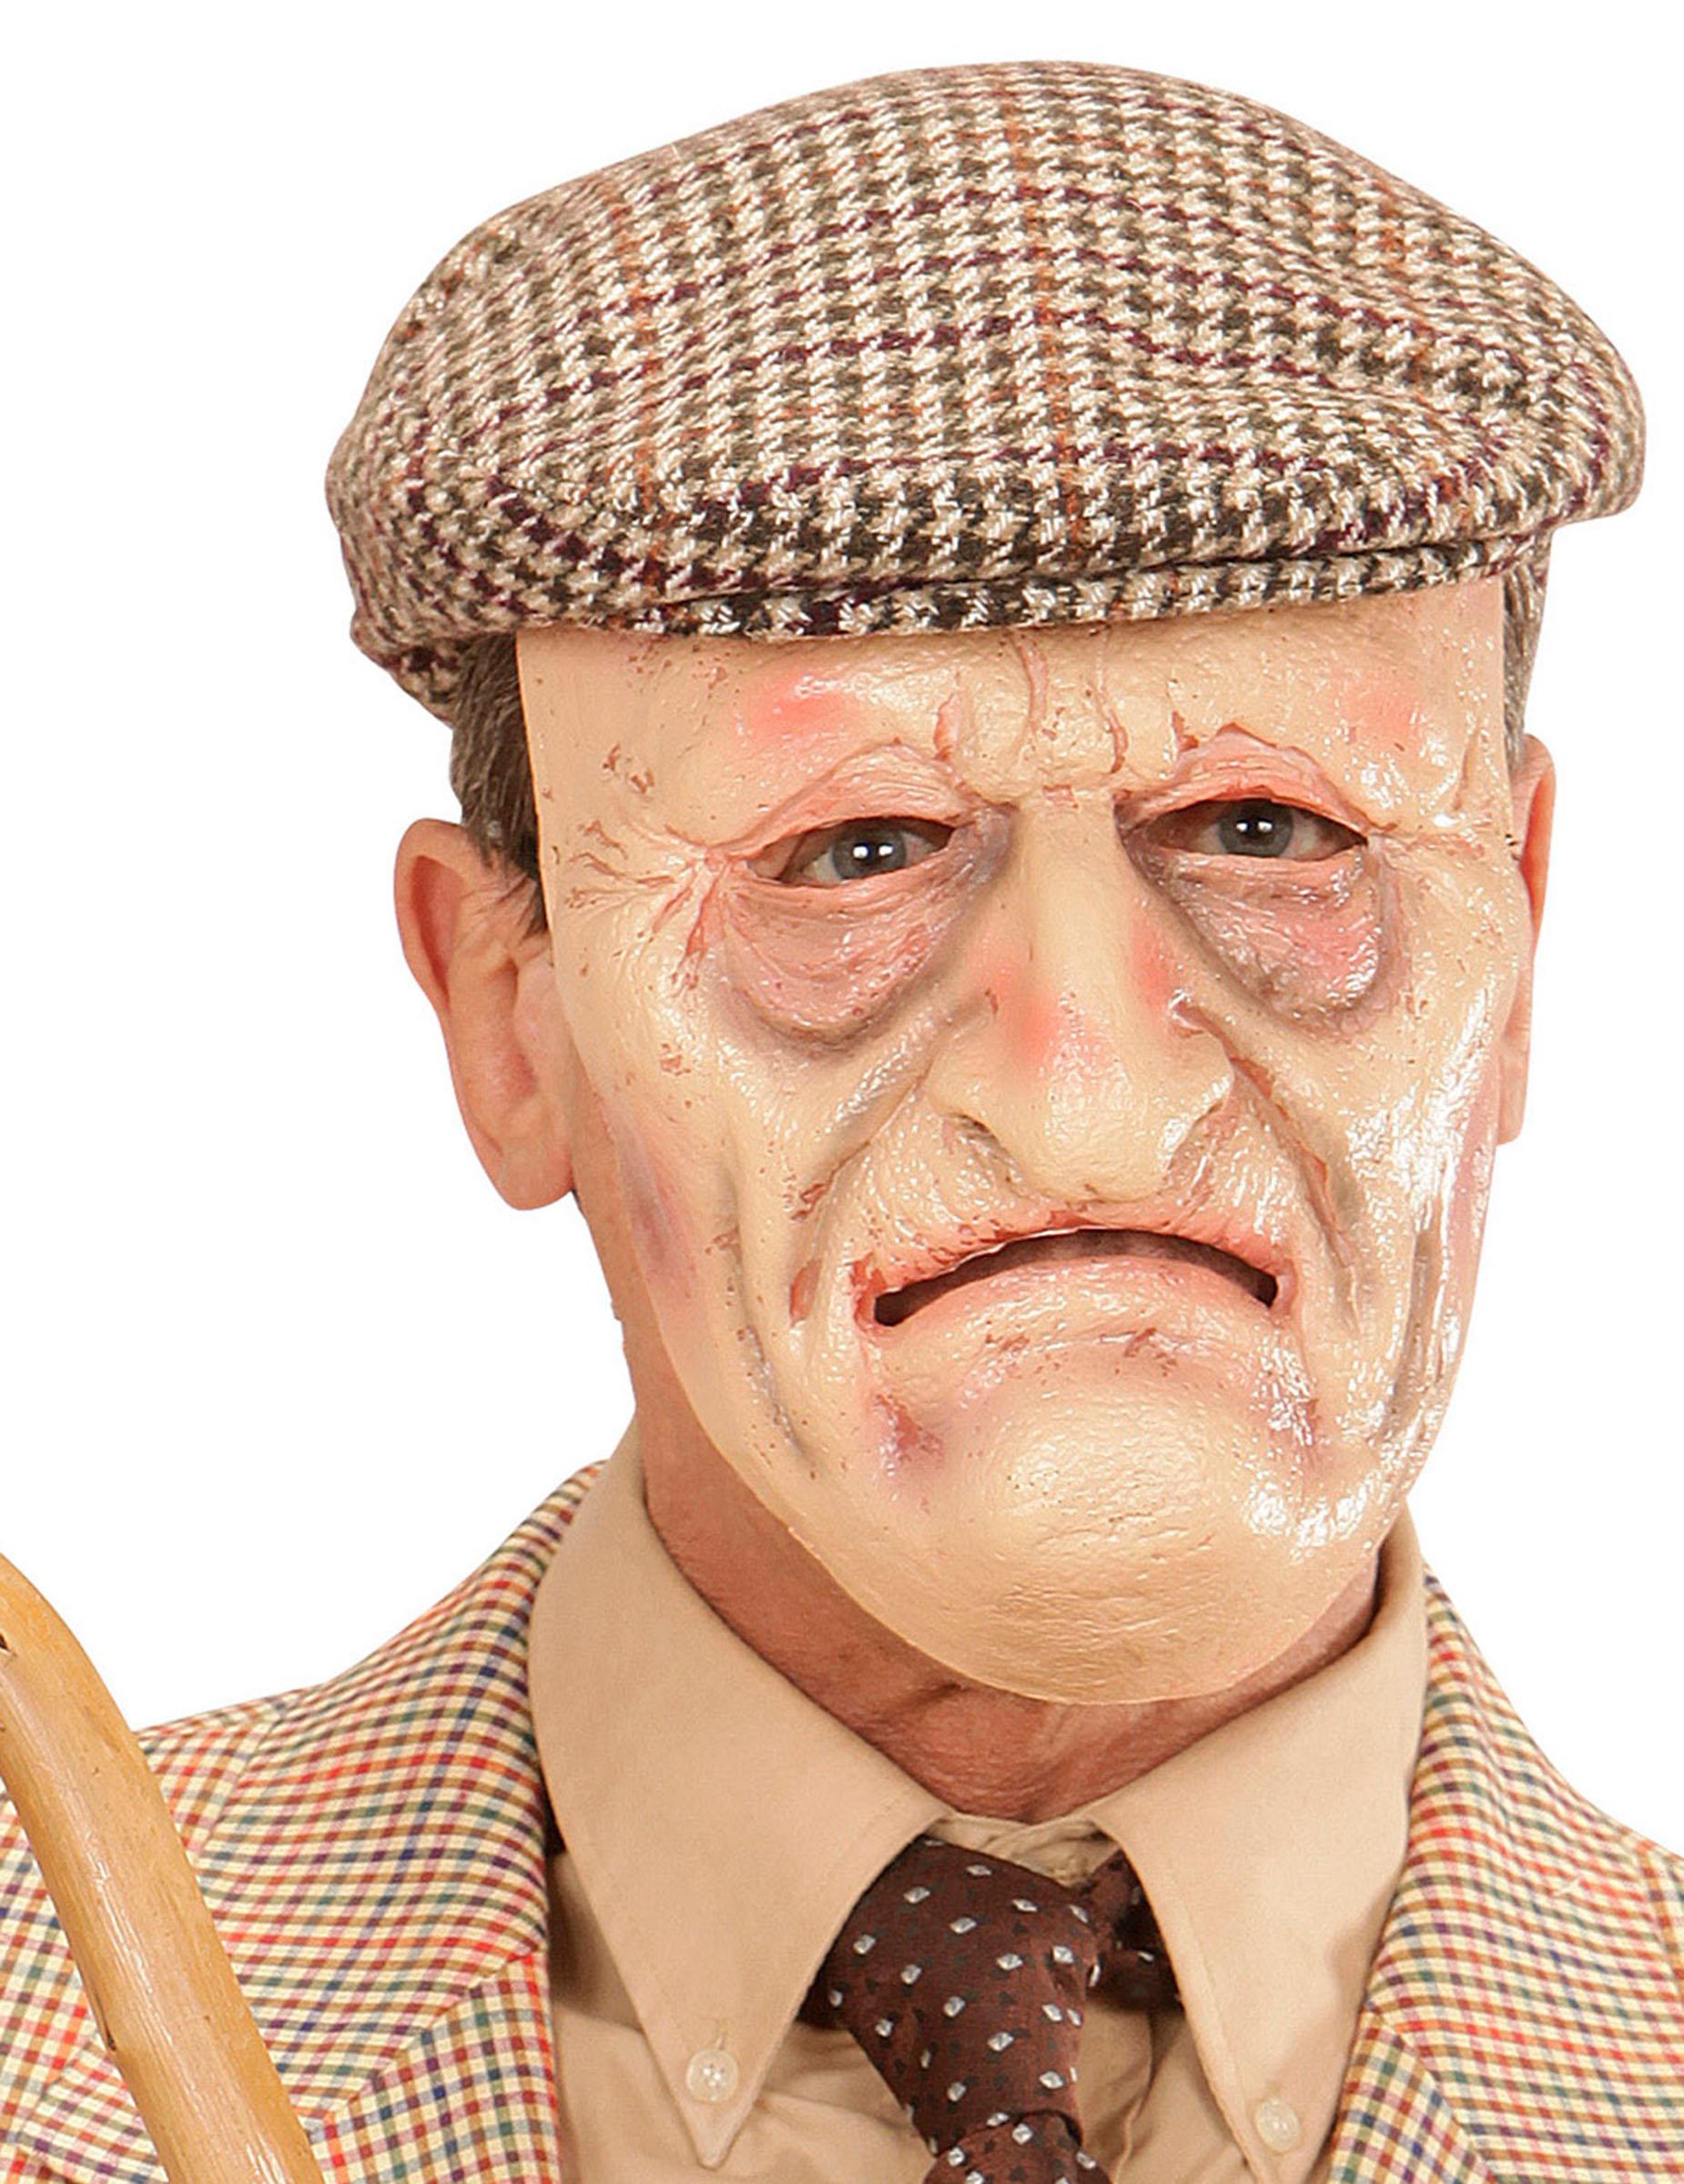 alter opa maske f r erwachsene g nstige faschings masken bei karneval megastore. Black Bedroom Furniture Sets. Home Design Ideas